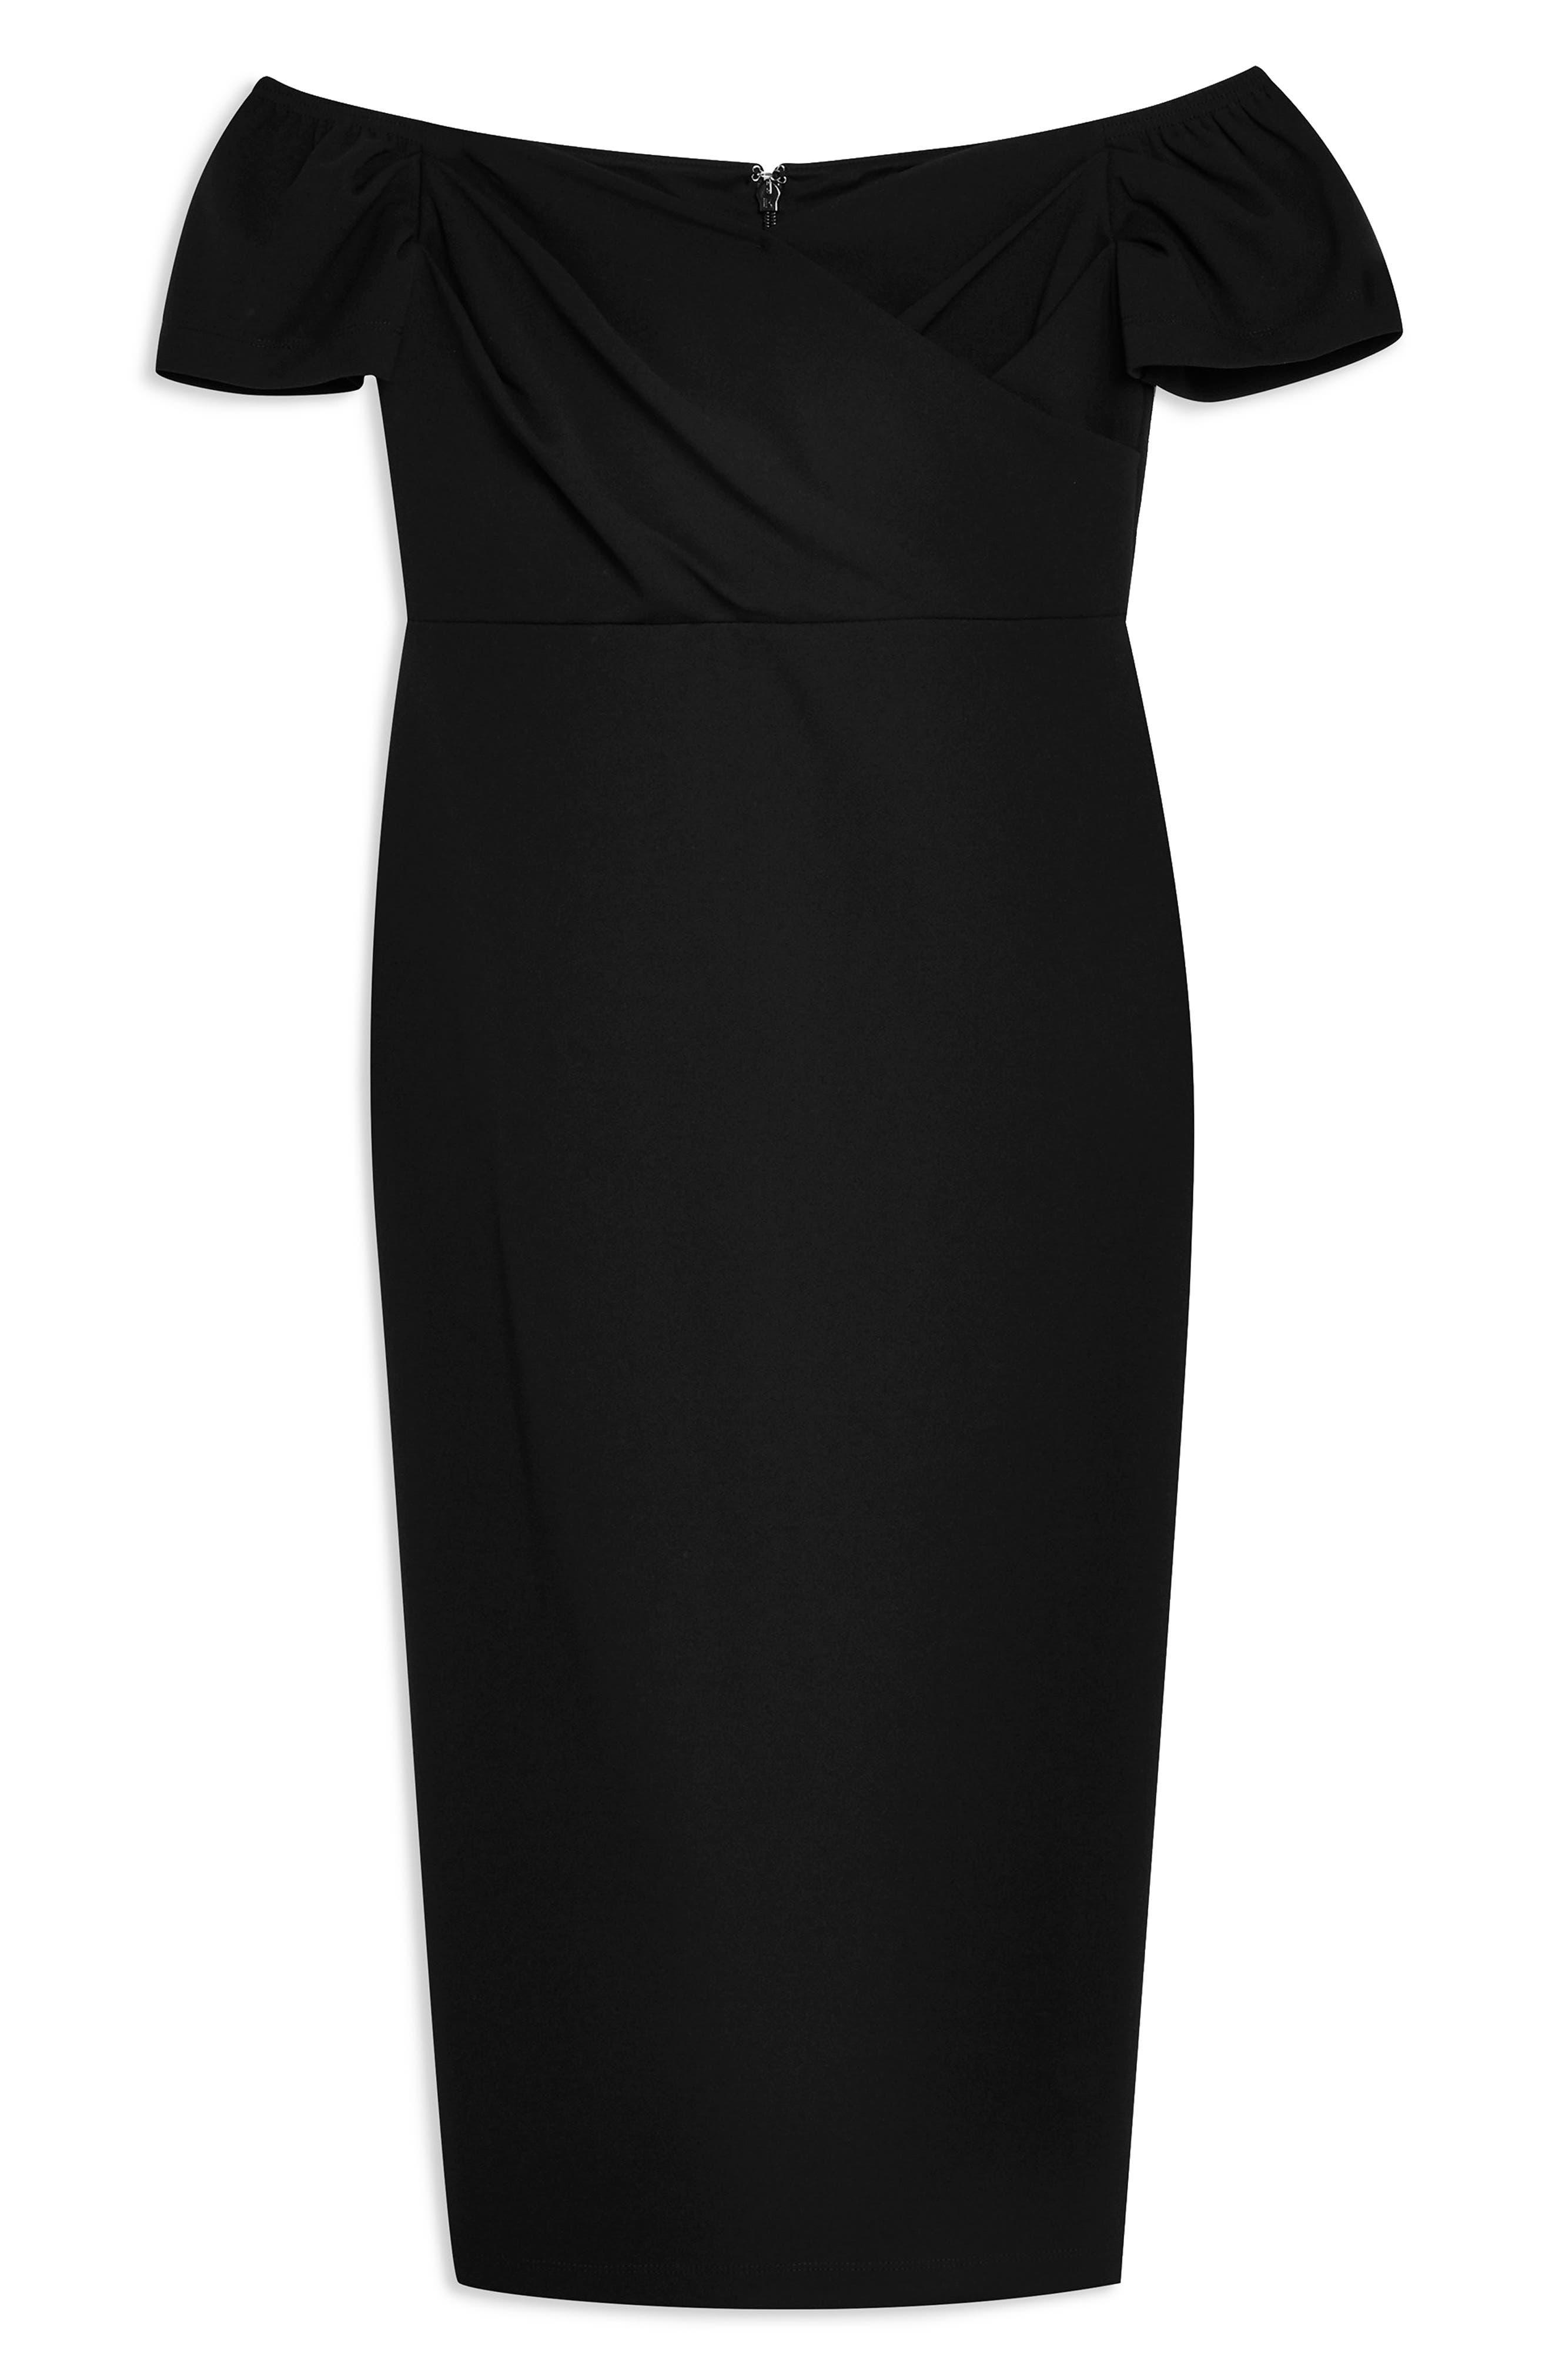 TOPSHOP, Off the Shoulder Wrap Midi Dress, Alternate thumbnail 3, color, BLACK